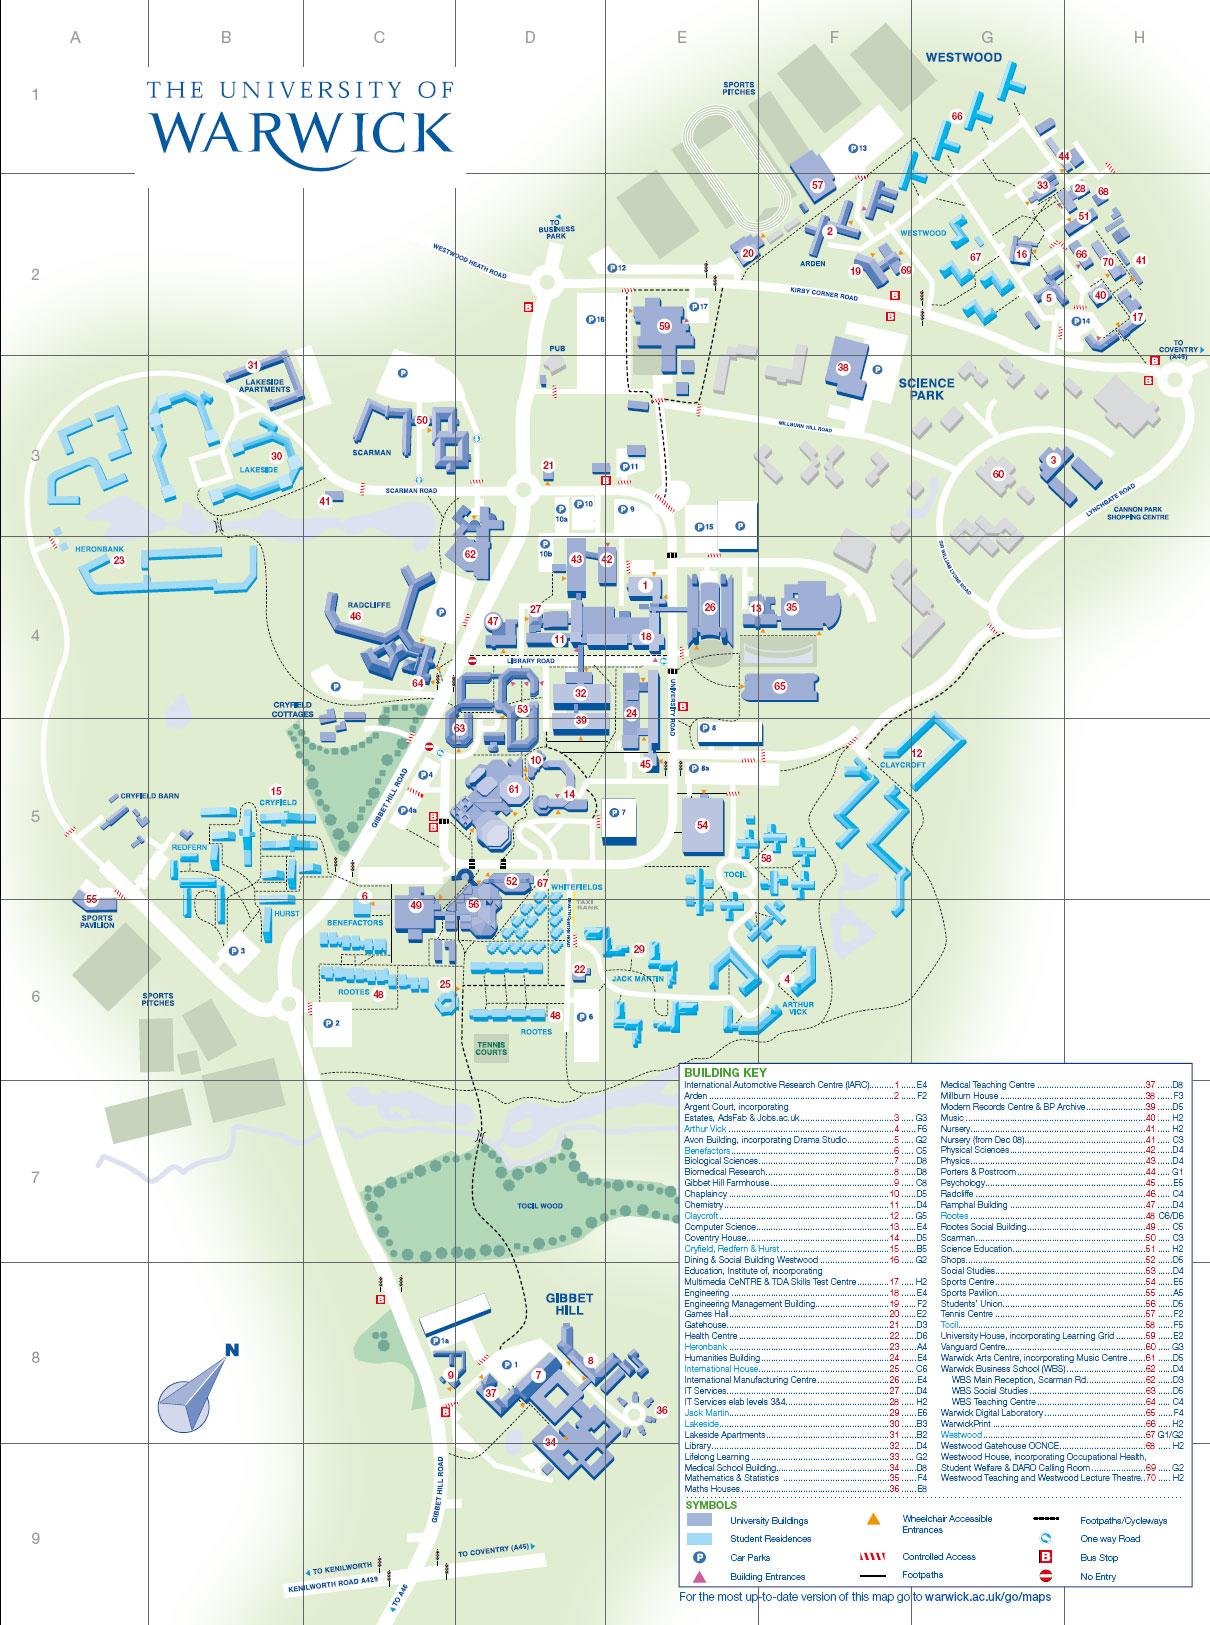 Moac dtc senate house university of warwick coventry cv4 7al